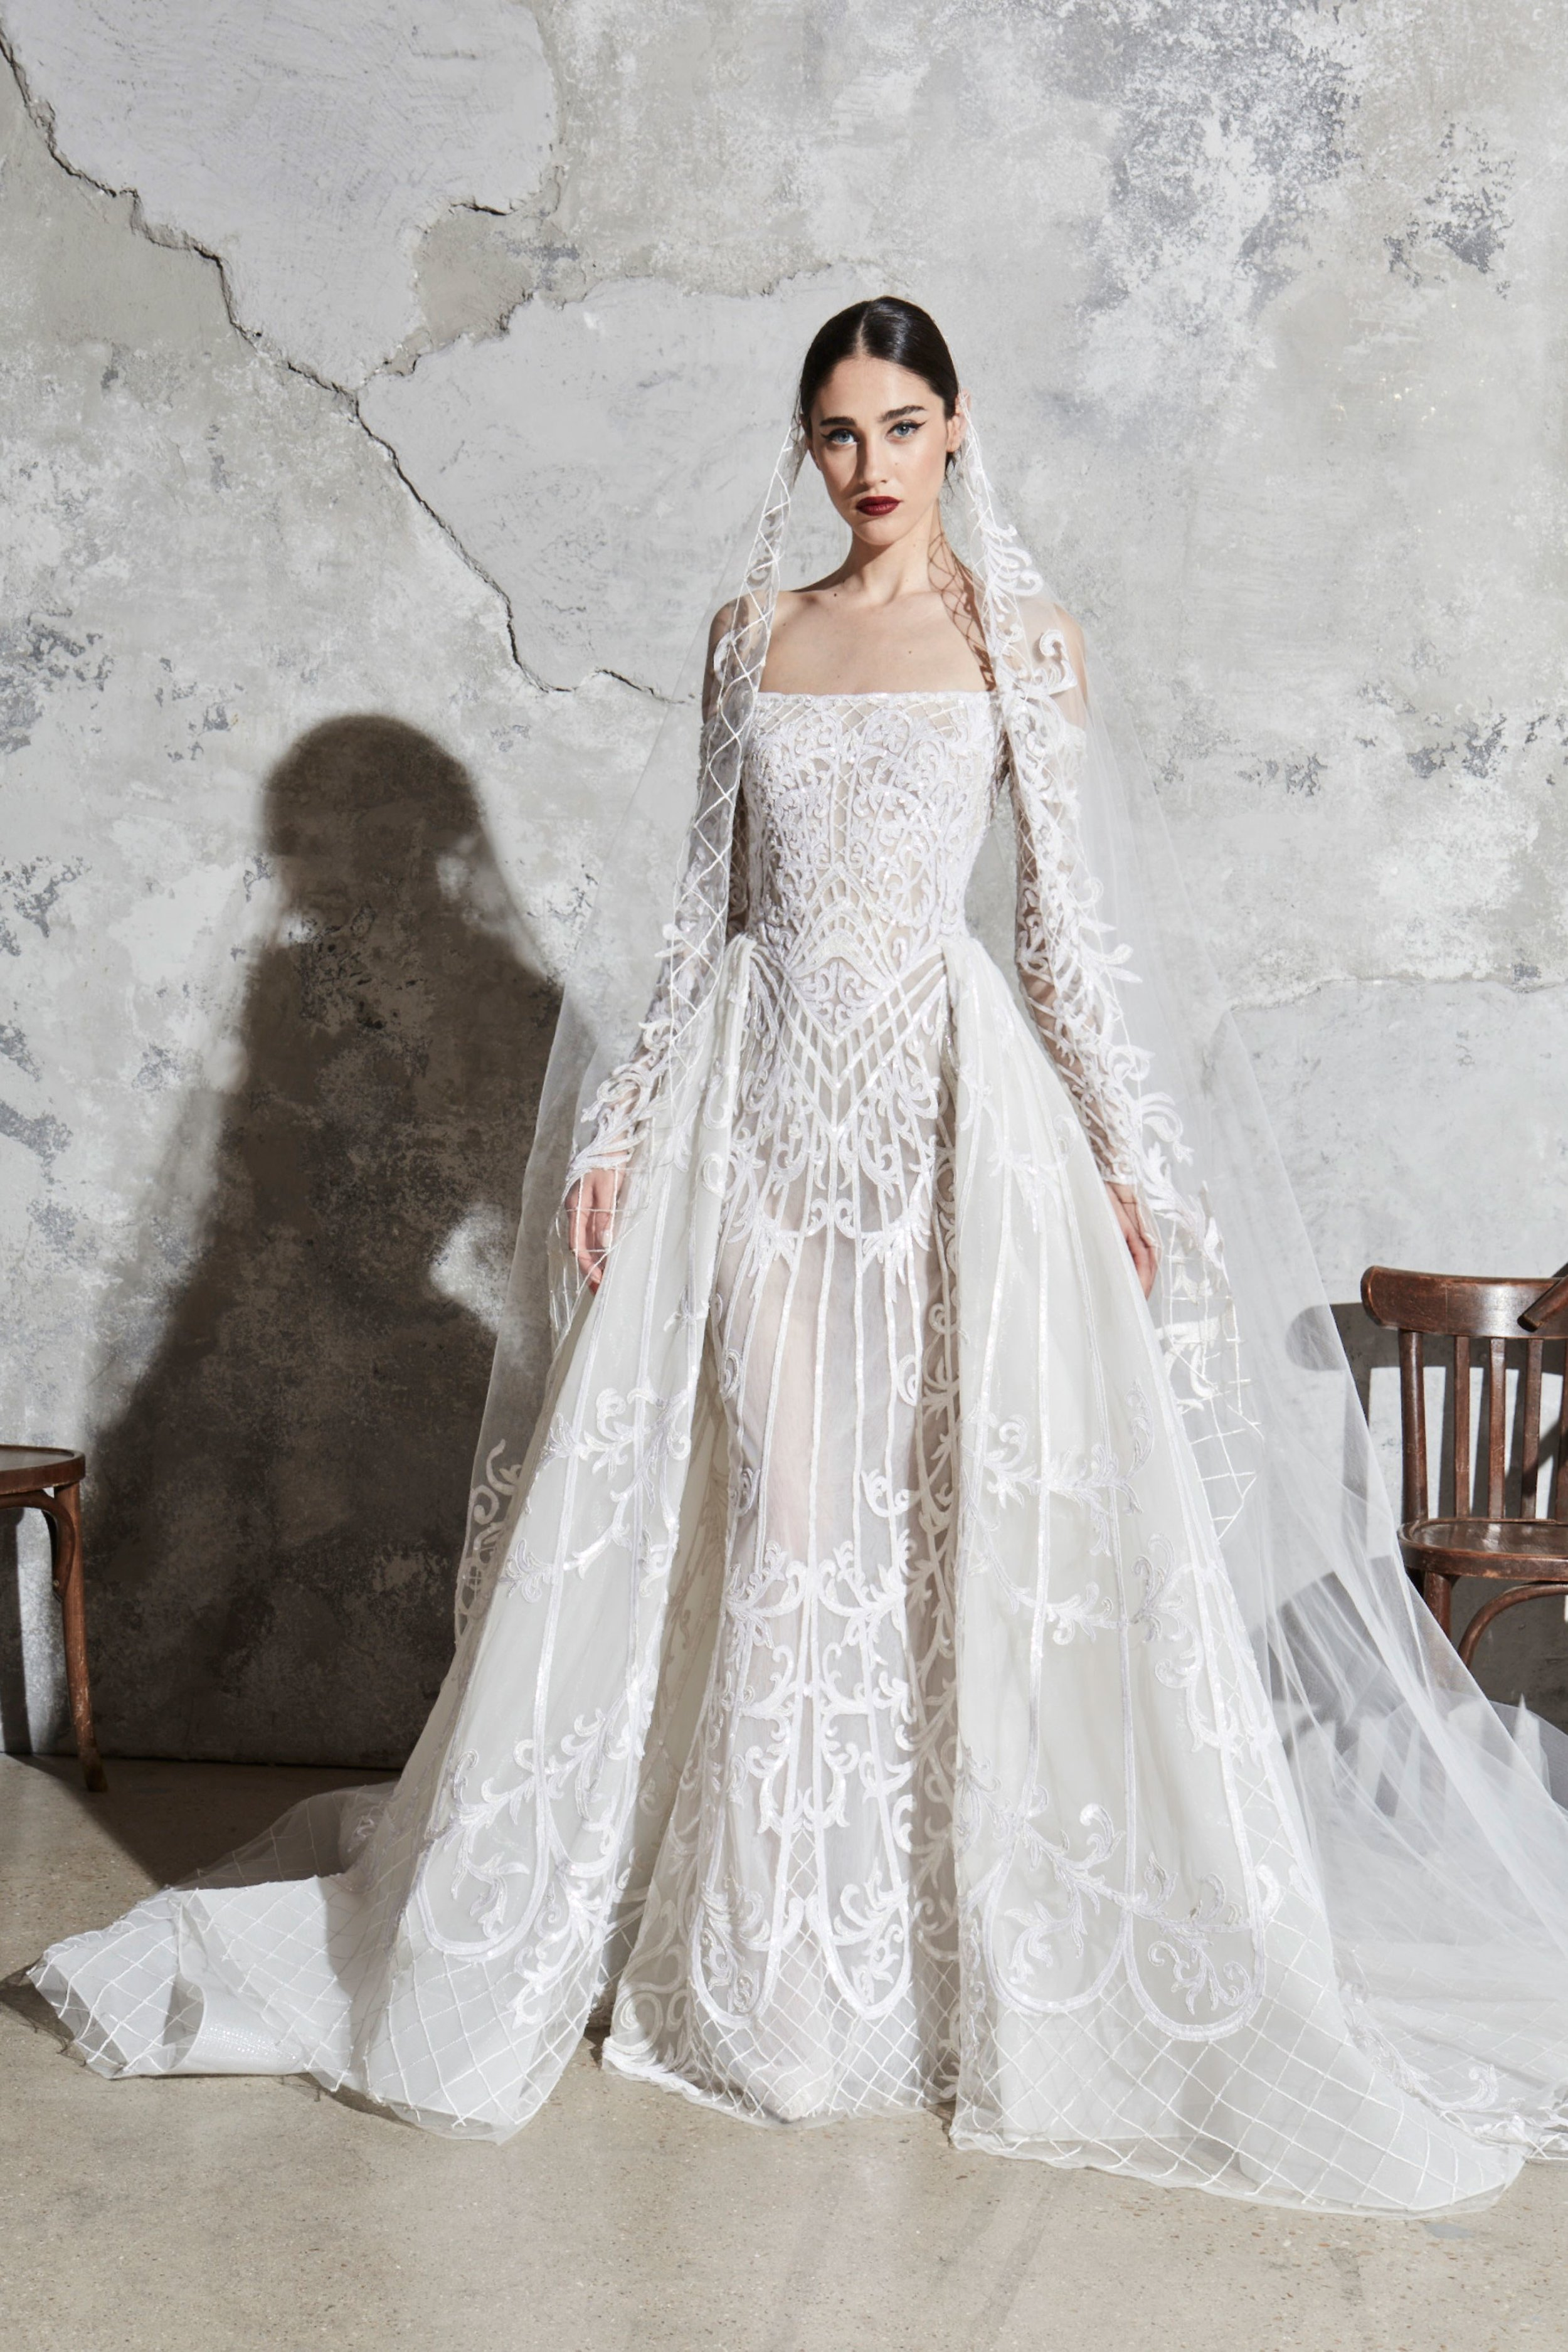 00017-zuhair-murad-new-york-bridal-Spring-2020-CREDIT-Thomas-Nutzl.jpg